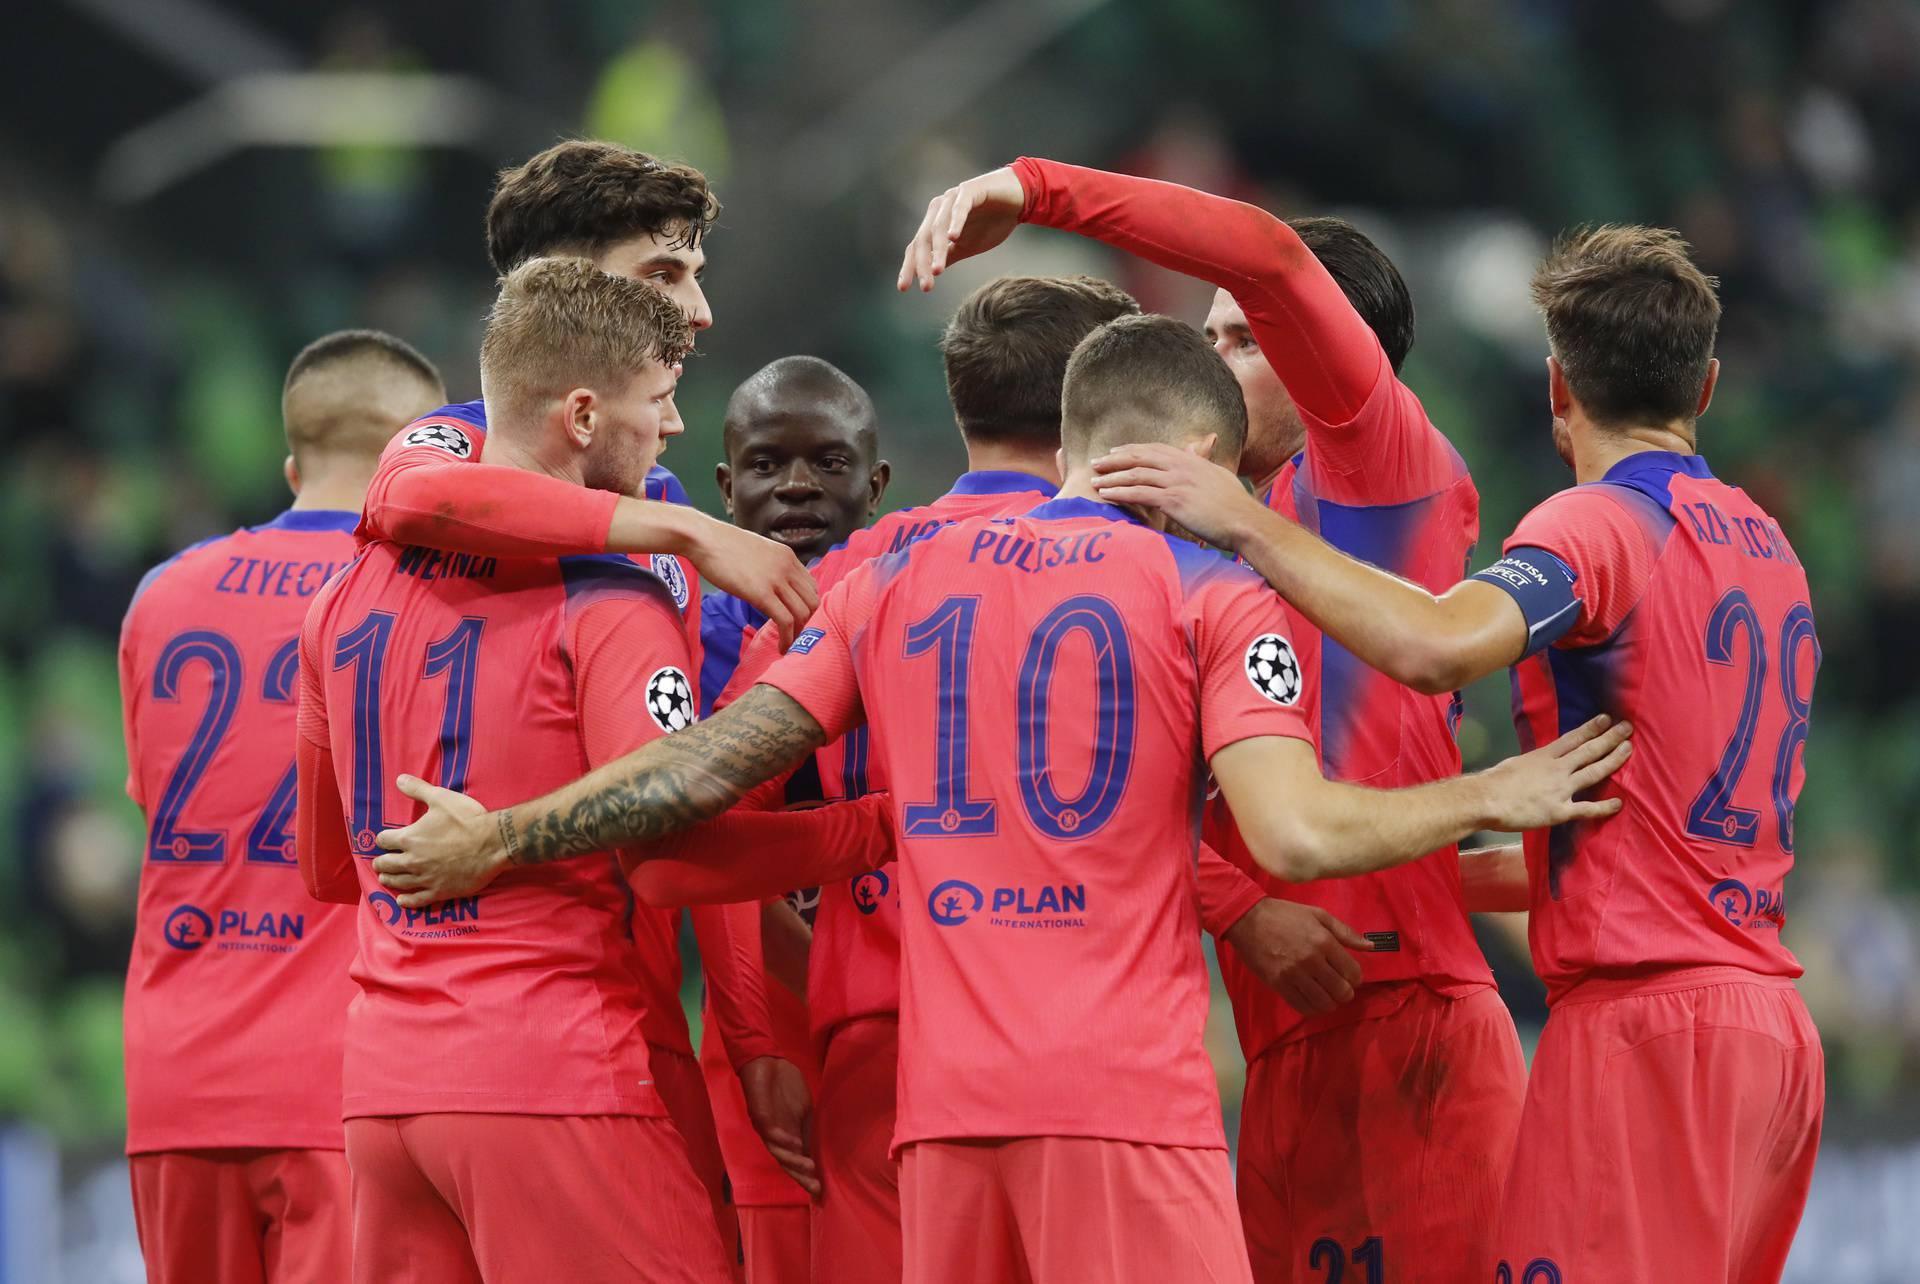 Champions League - Group E - FC Krasnodar v Chelsea